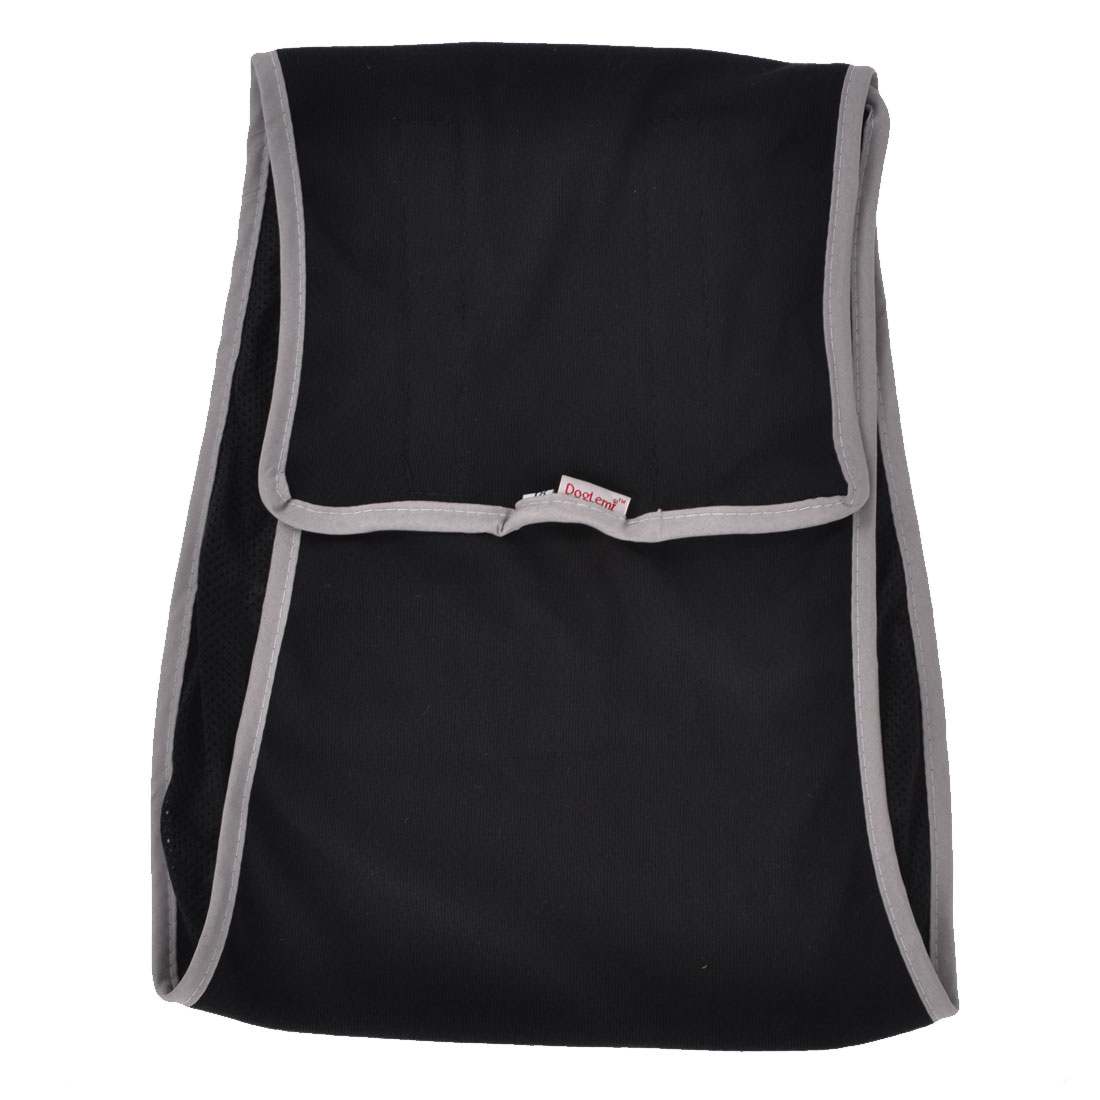 Black Gray Detachable Closure Adjustable Pet Dog Yorkie Waist Pants Size XL